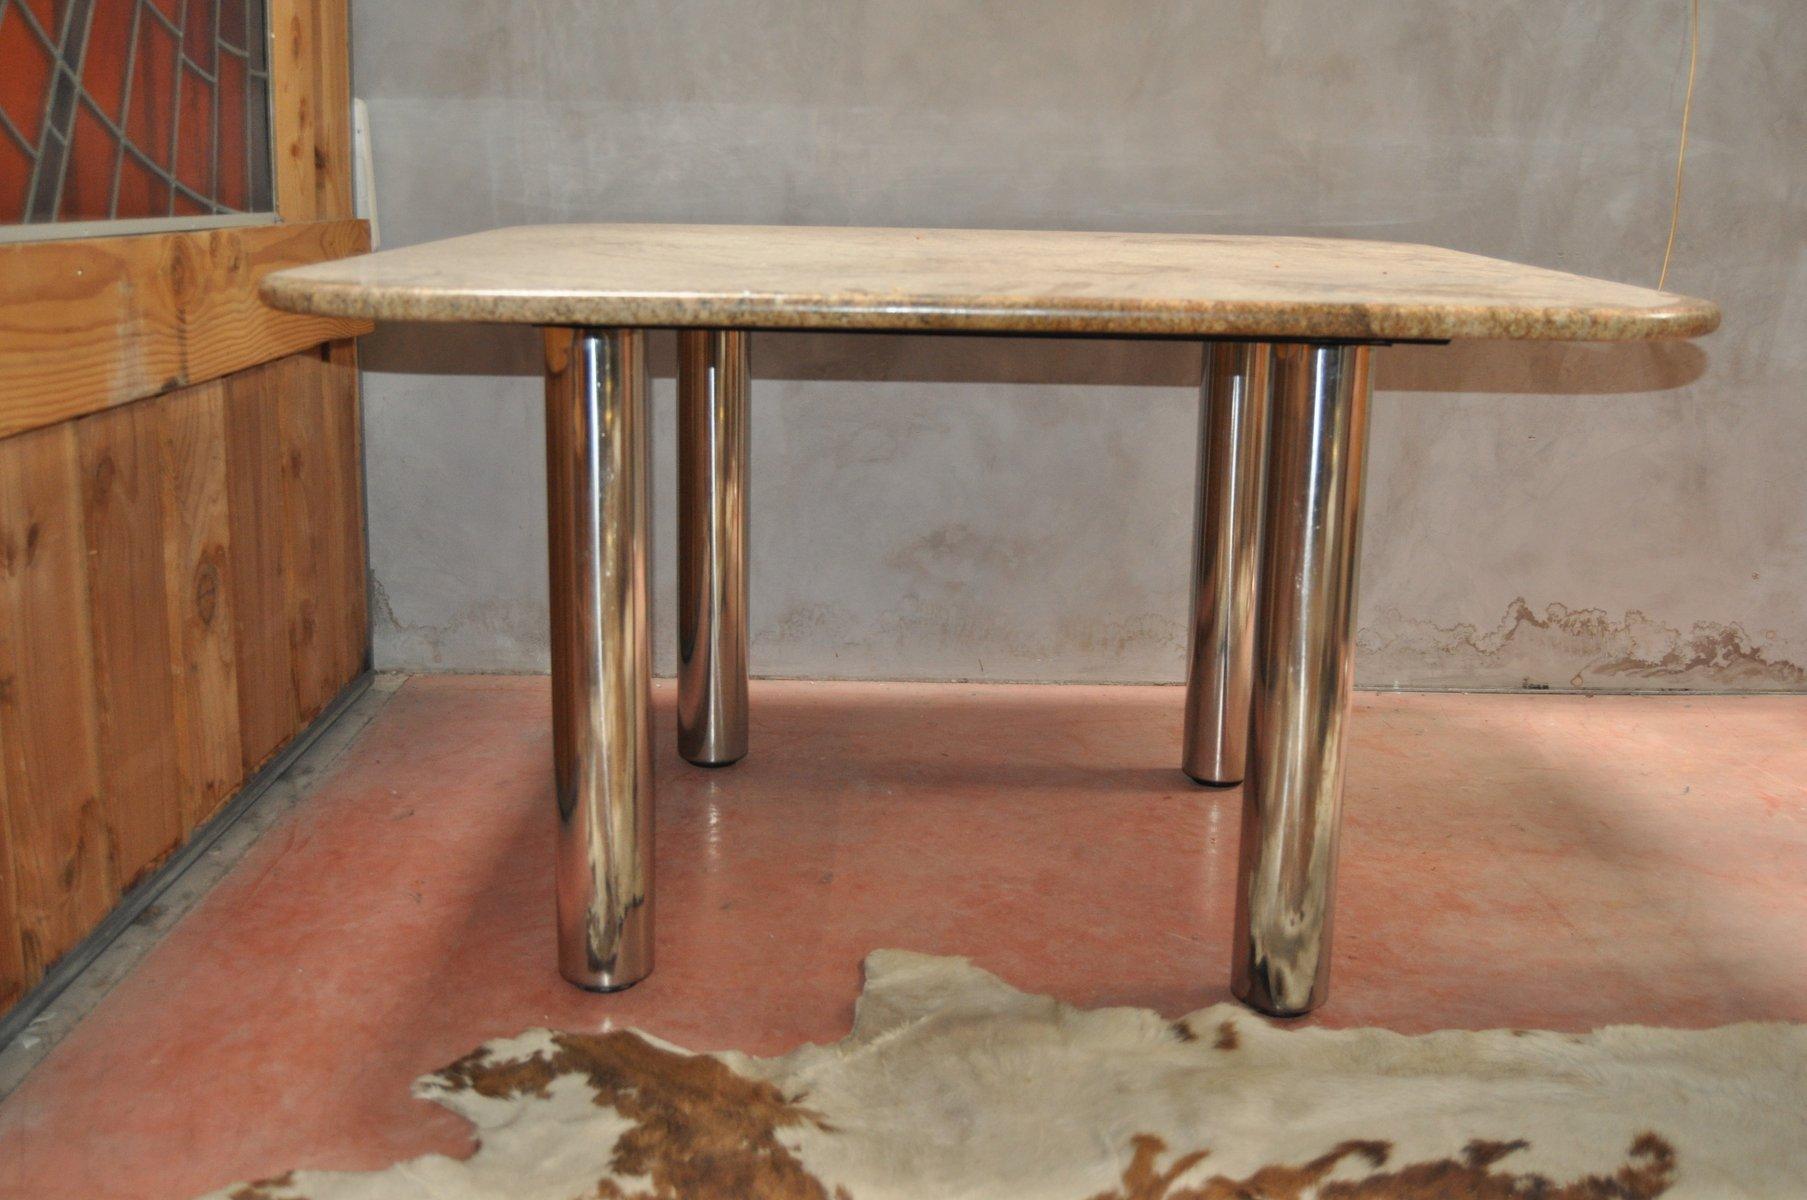 Table de salle manger marcuso vintage en marbre de for Salle a manger antique quebec